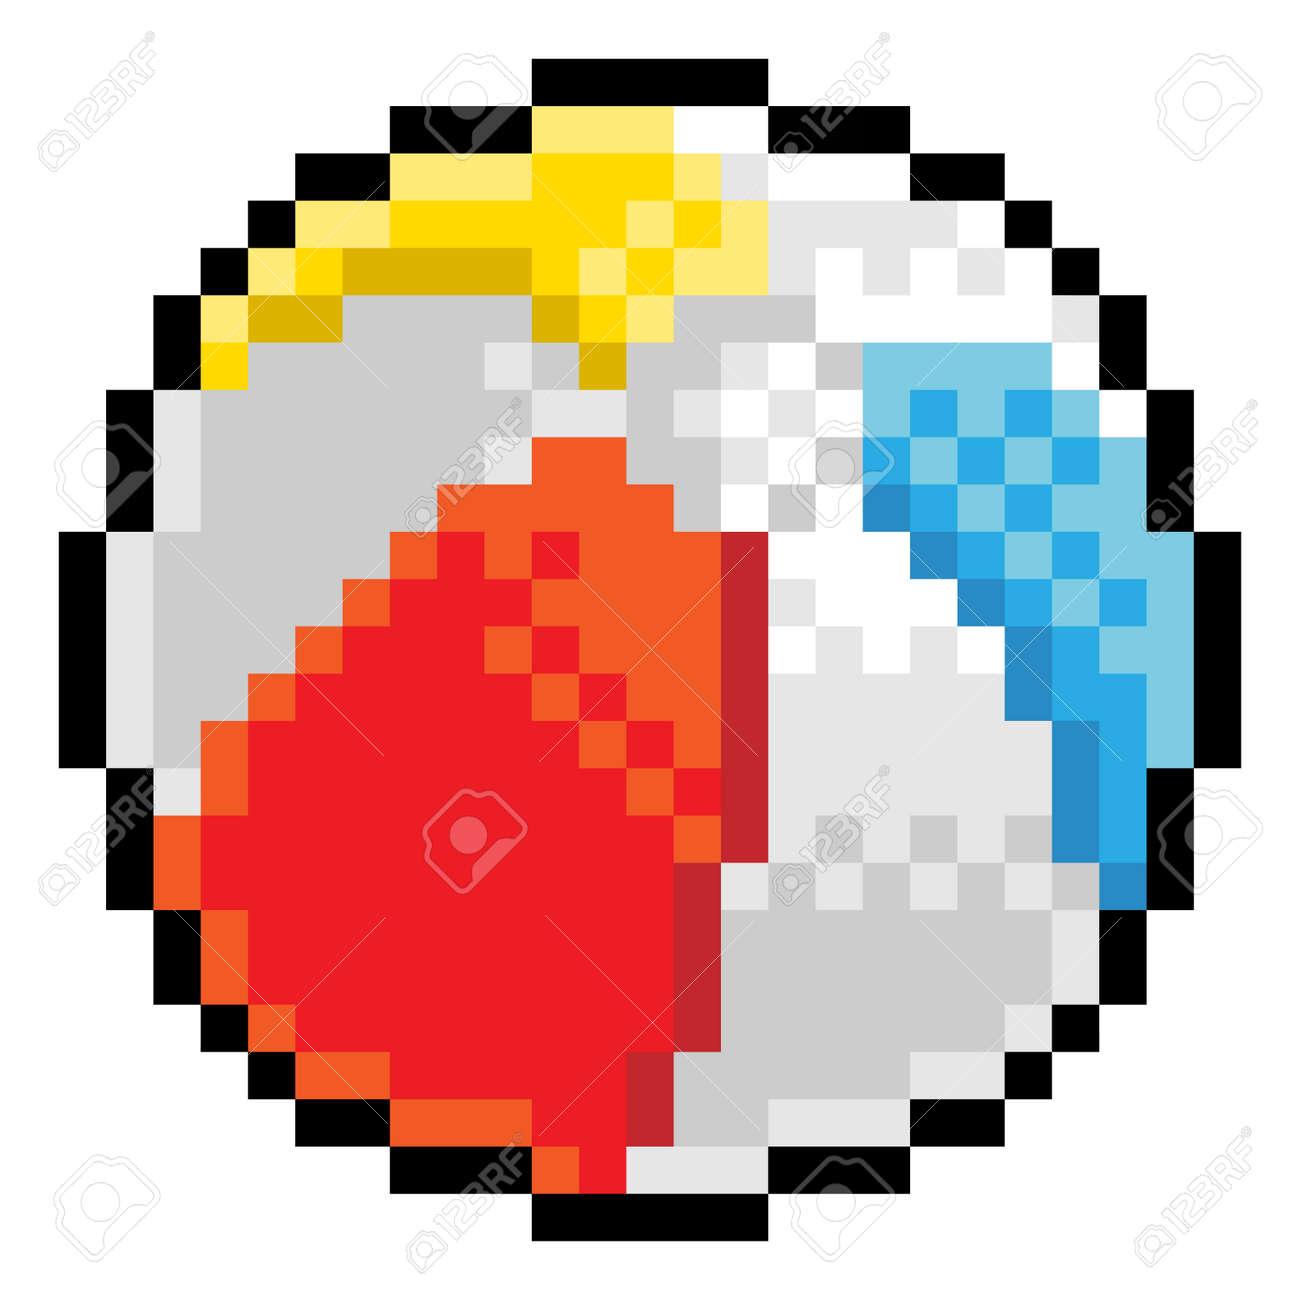 Beach Ball Pixel Art Eight Bit Game Icon - 155362922